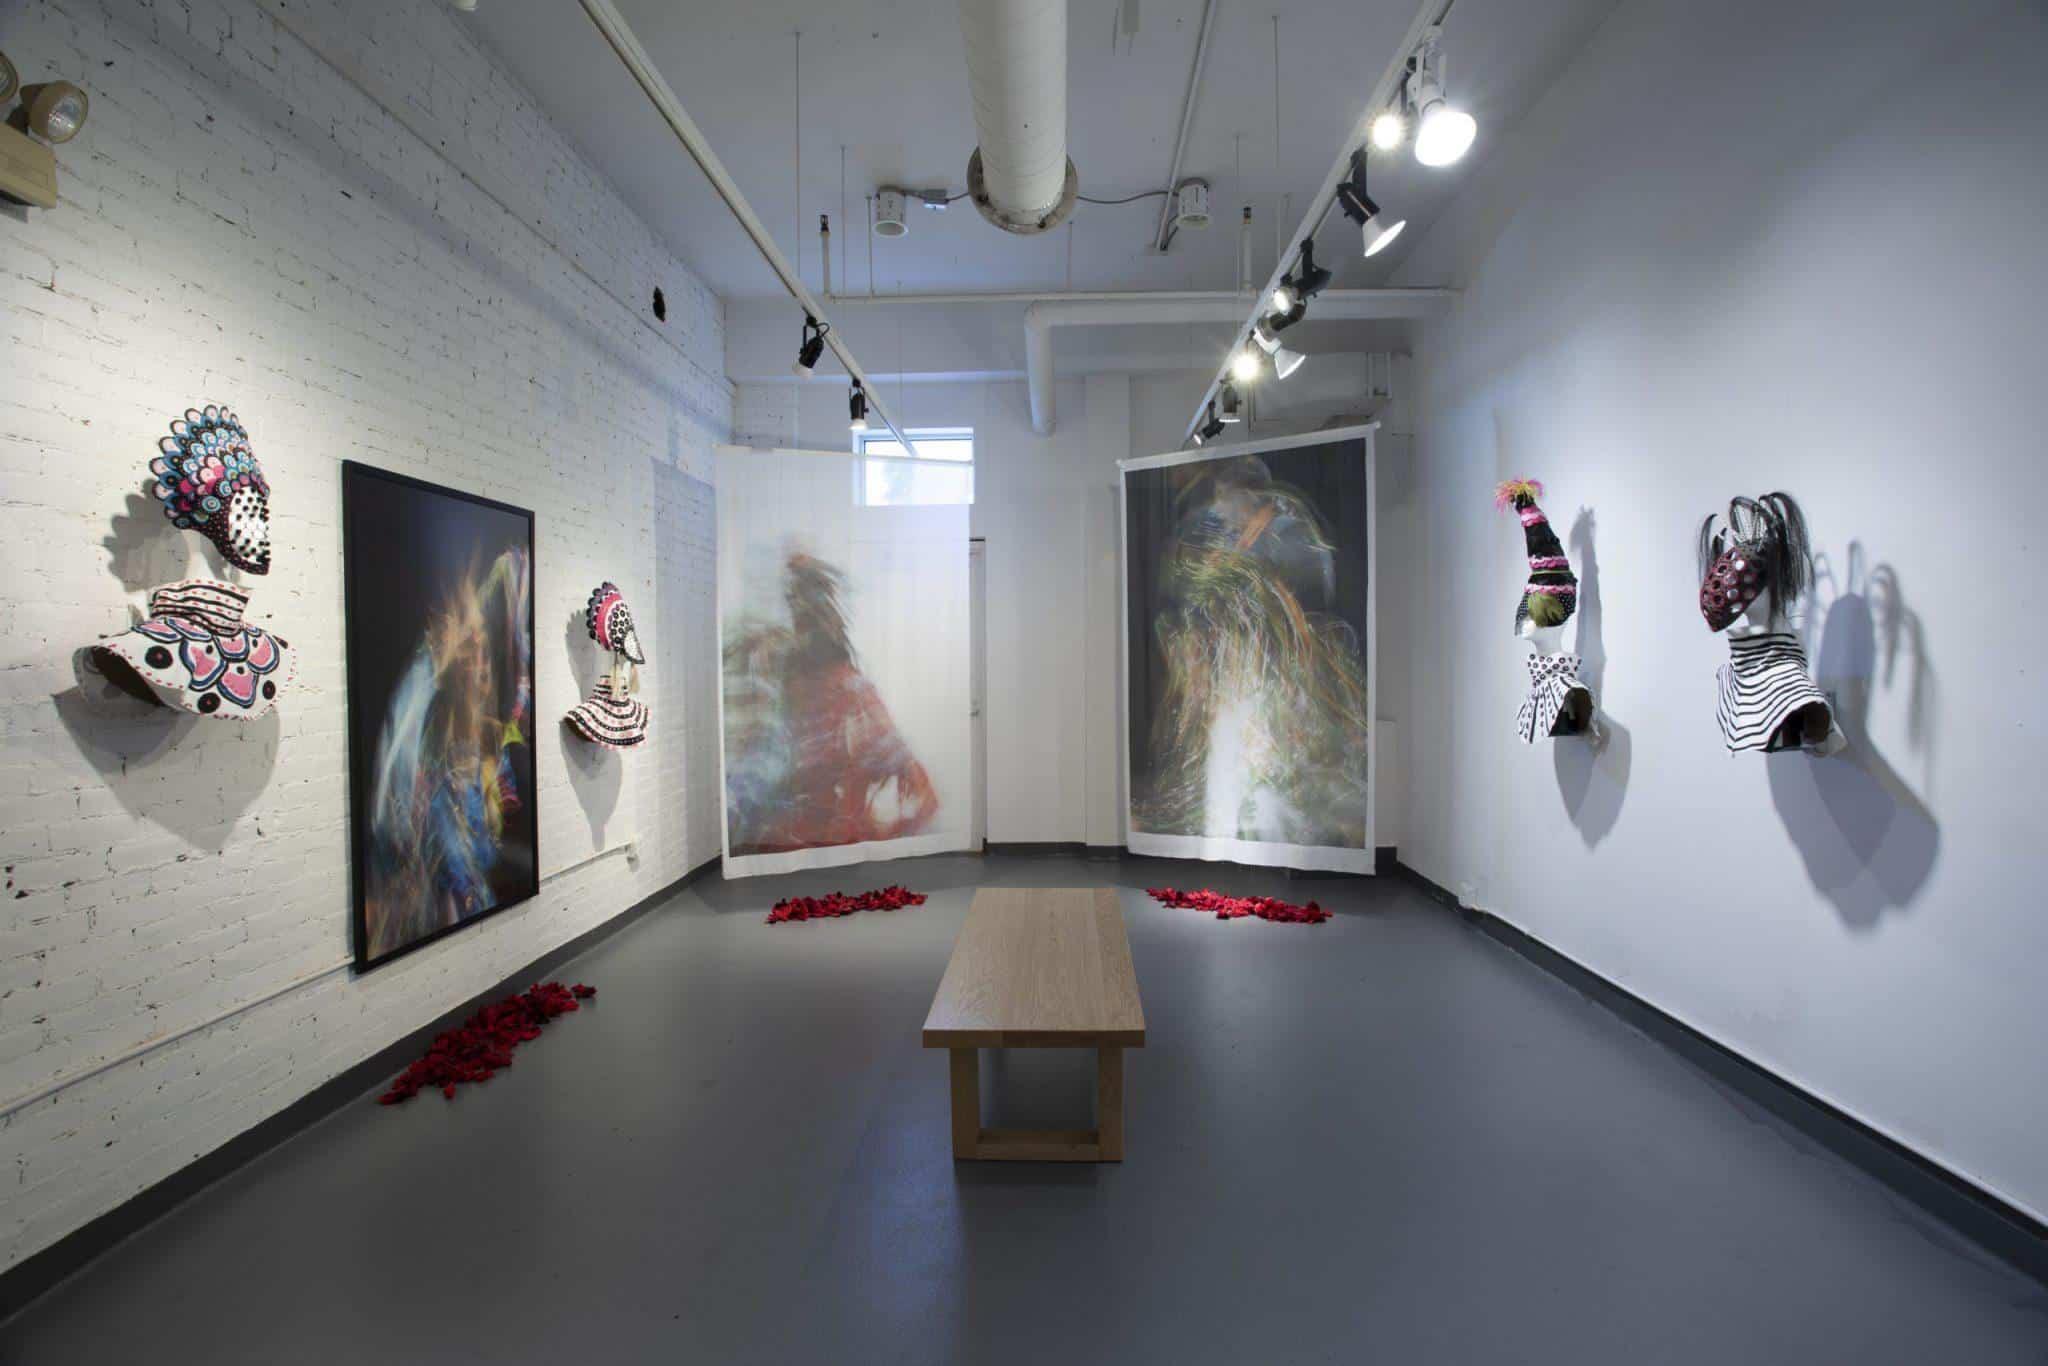 installation view Seven Spans, 2019. Photo credit Jessica Smolinski.